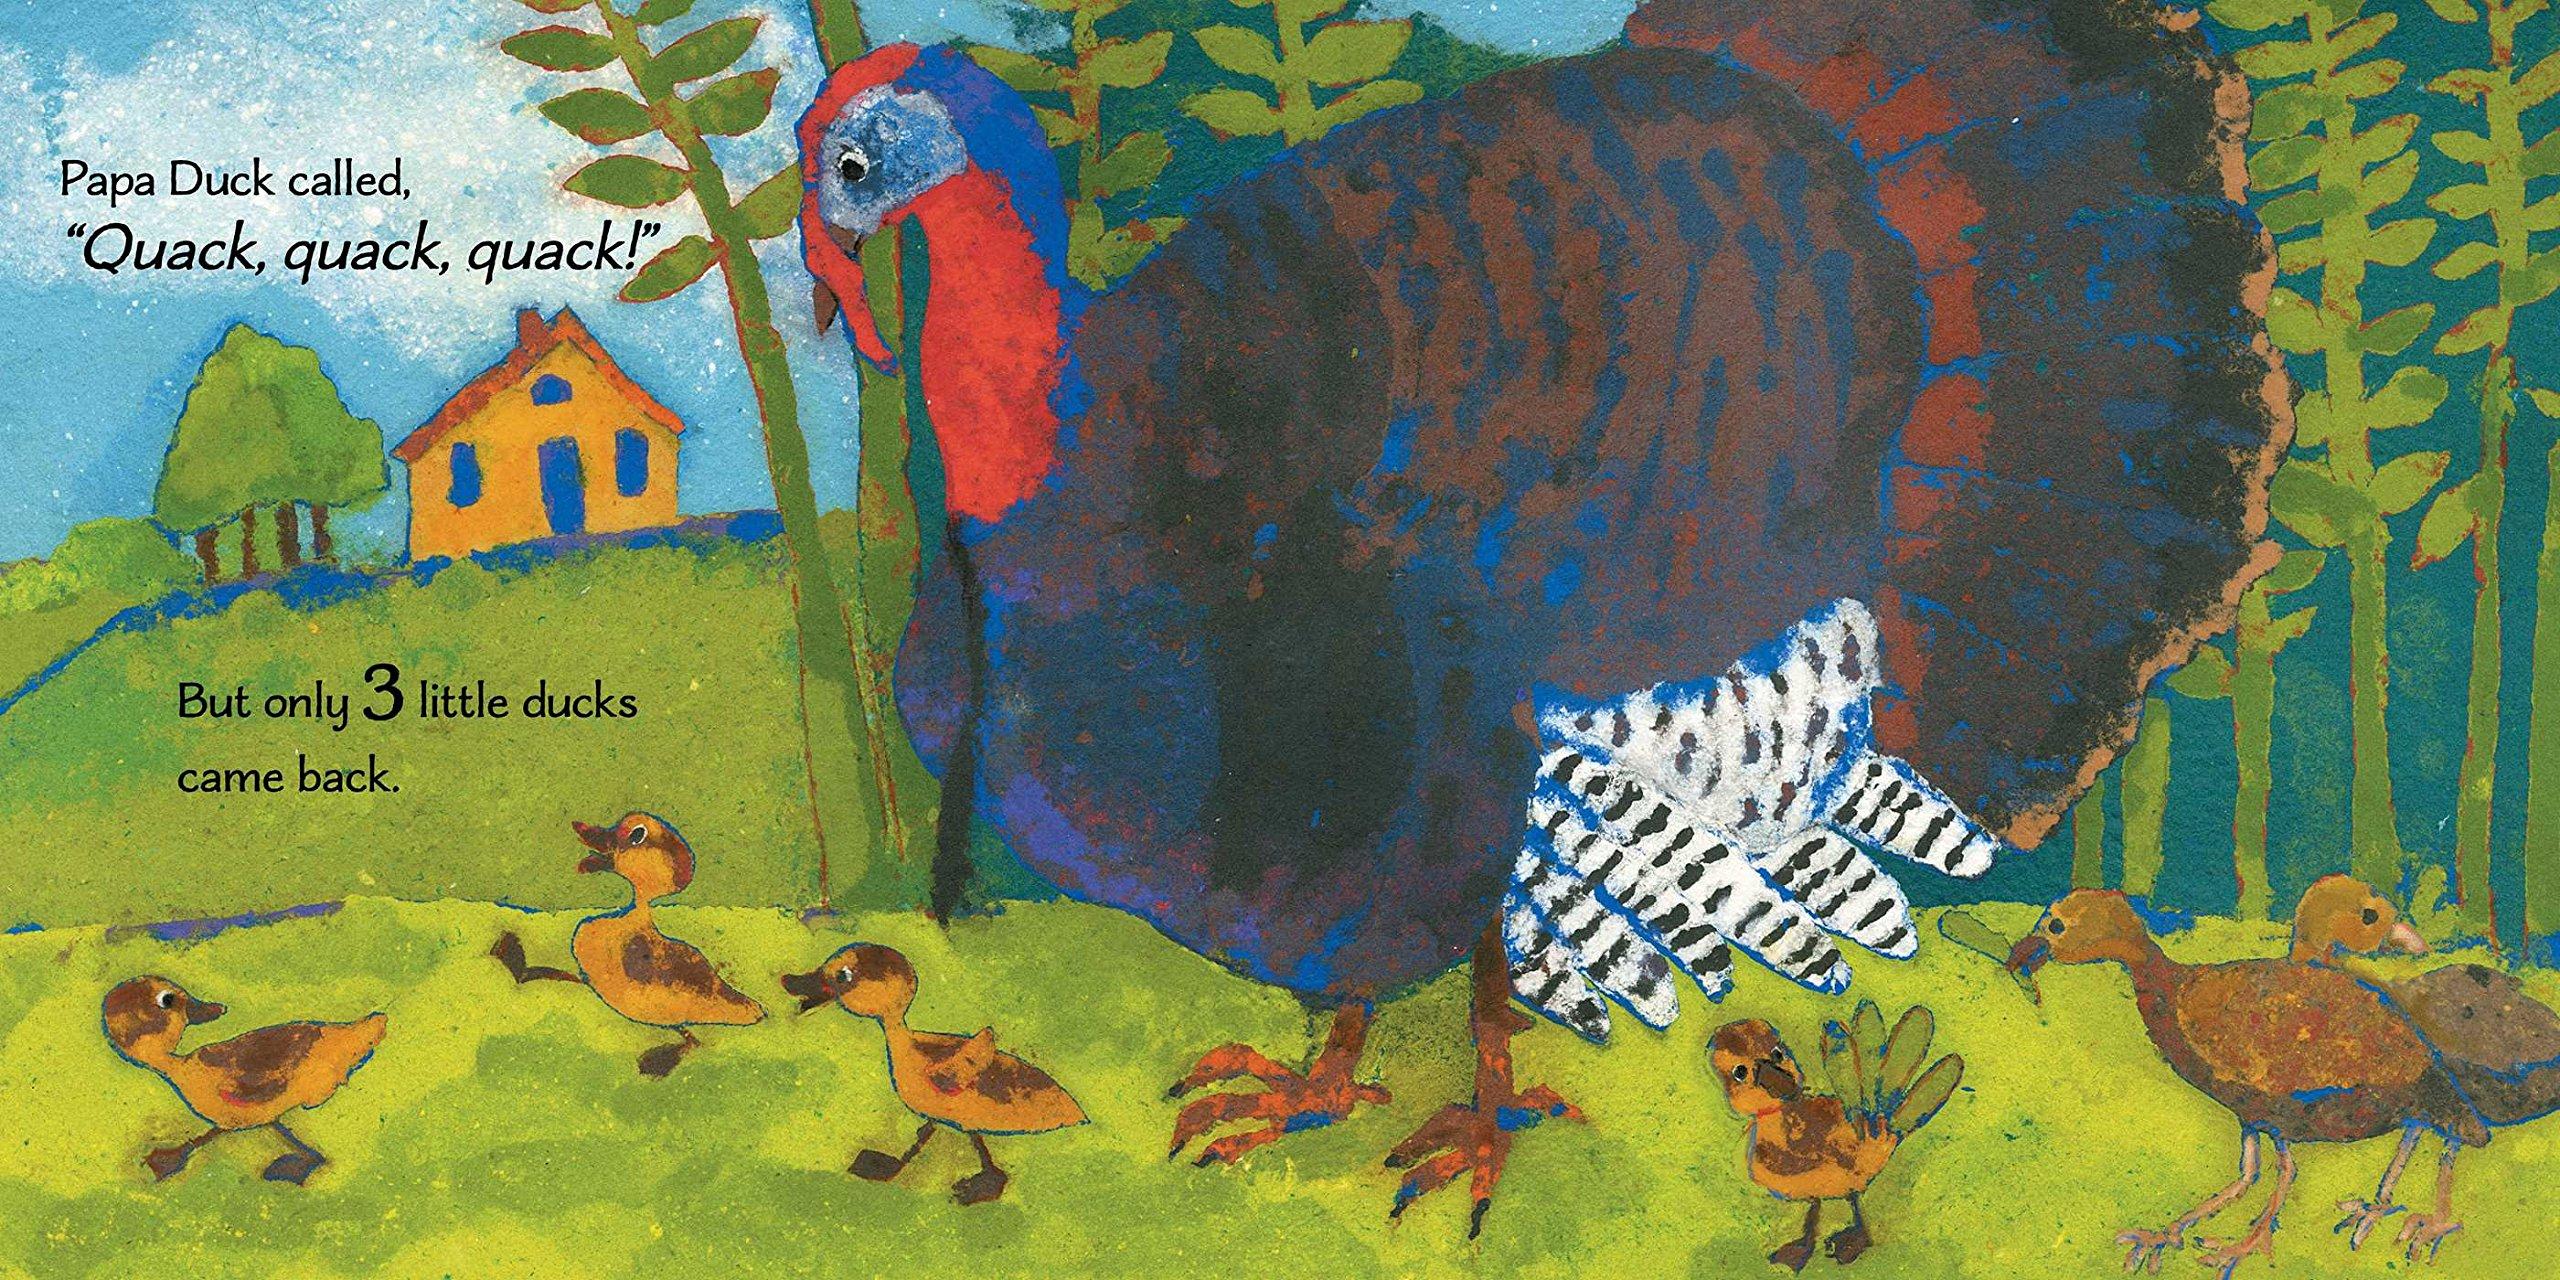 5 Little Ducks by Beach Lane Books (Image #3)